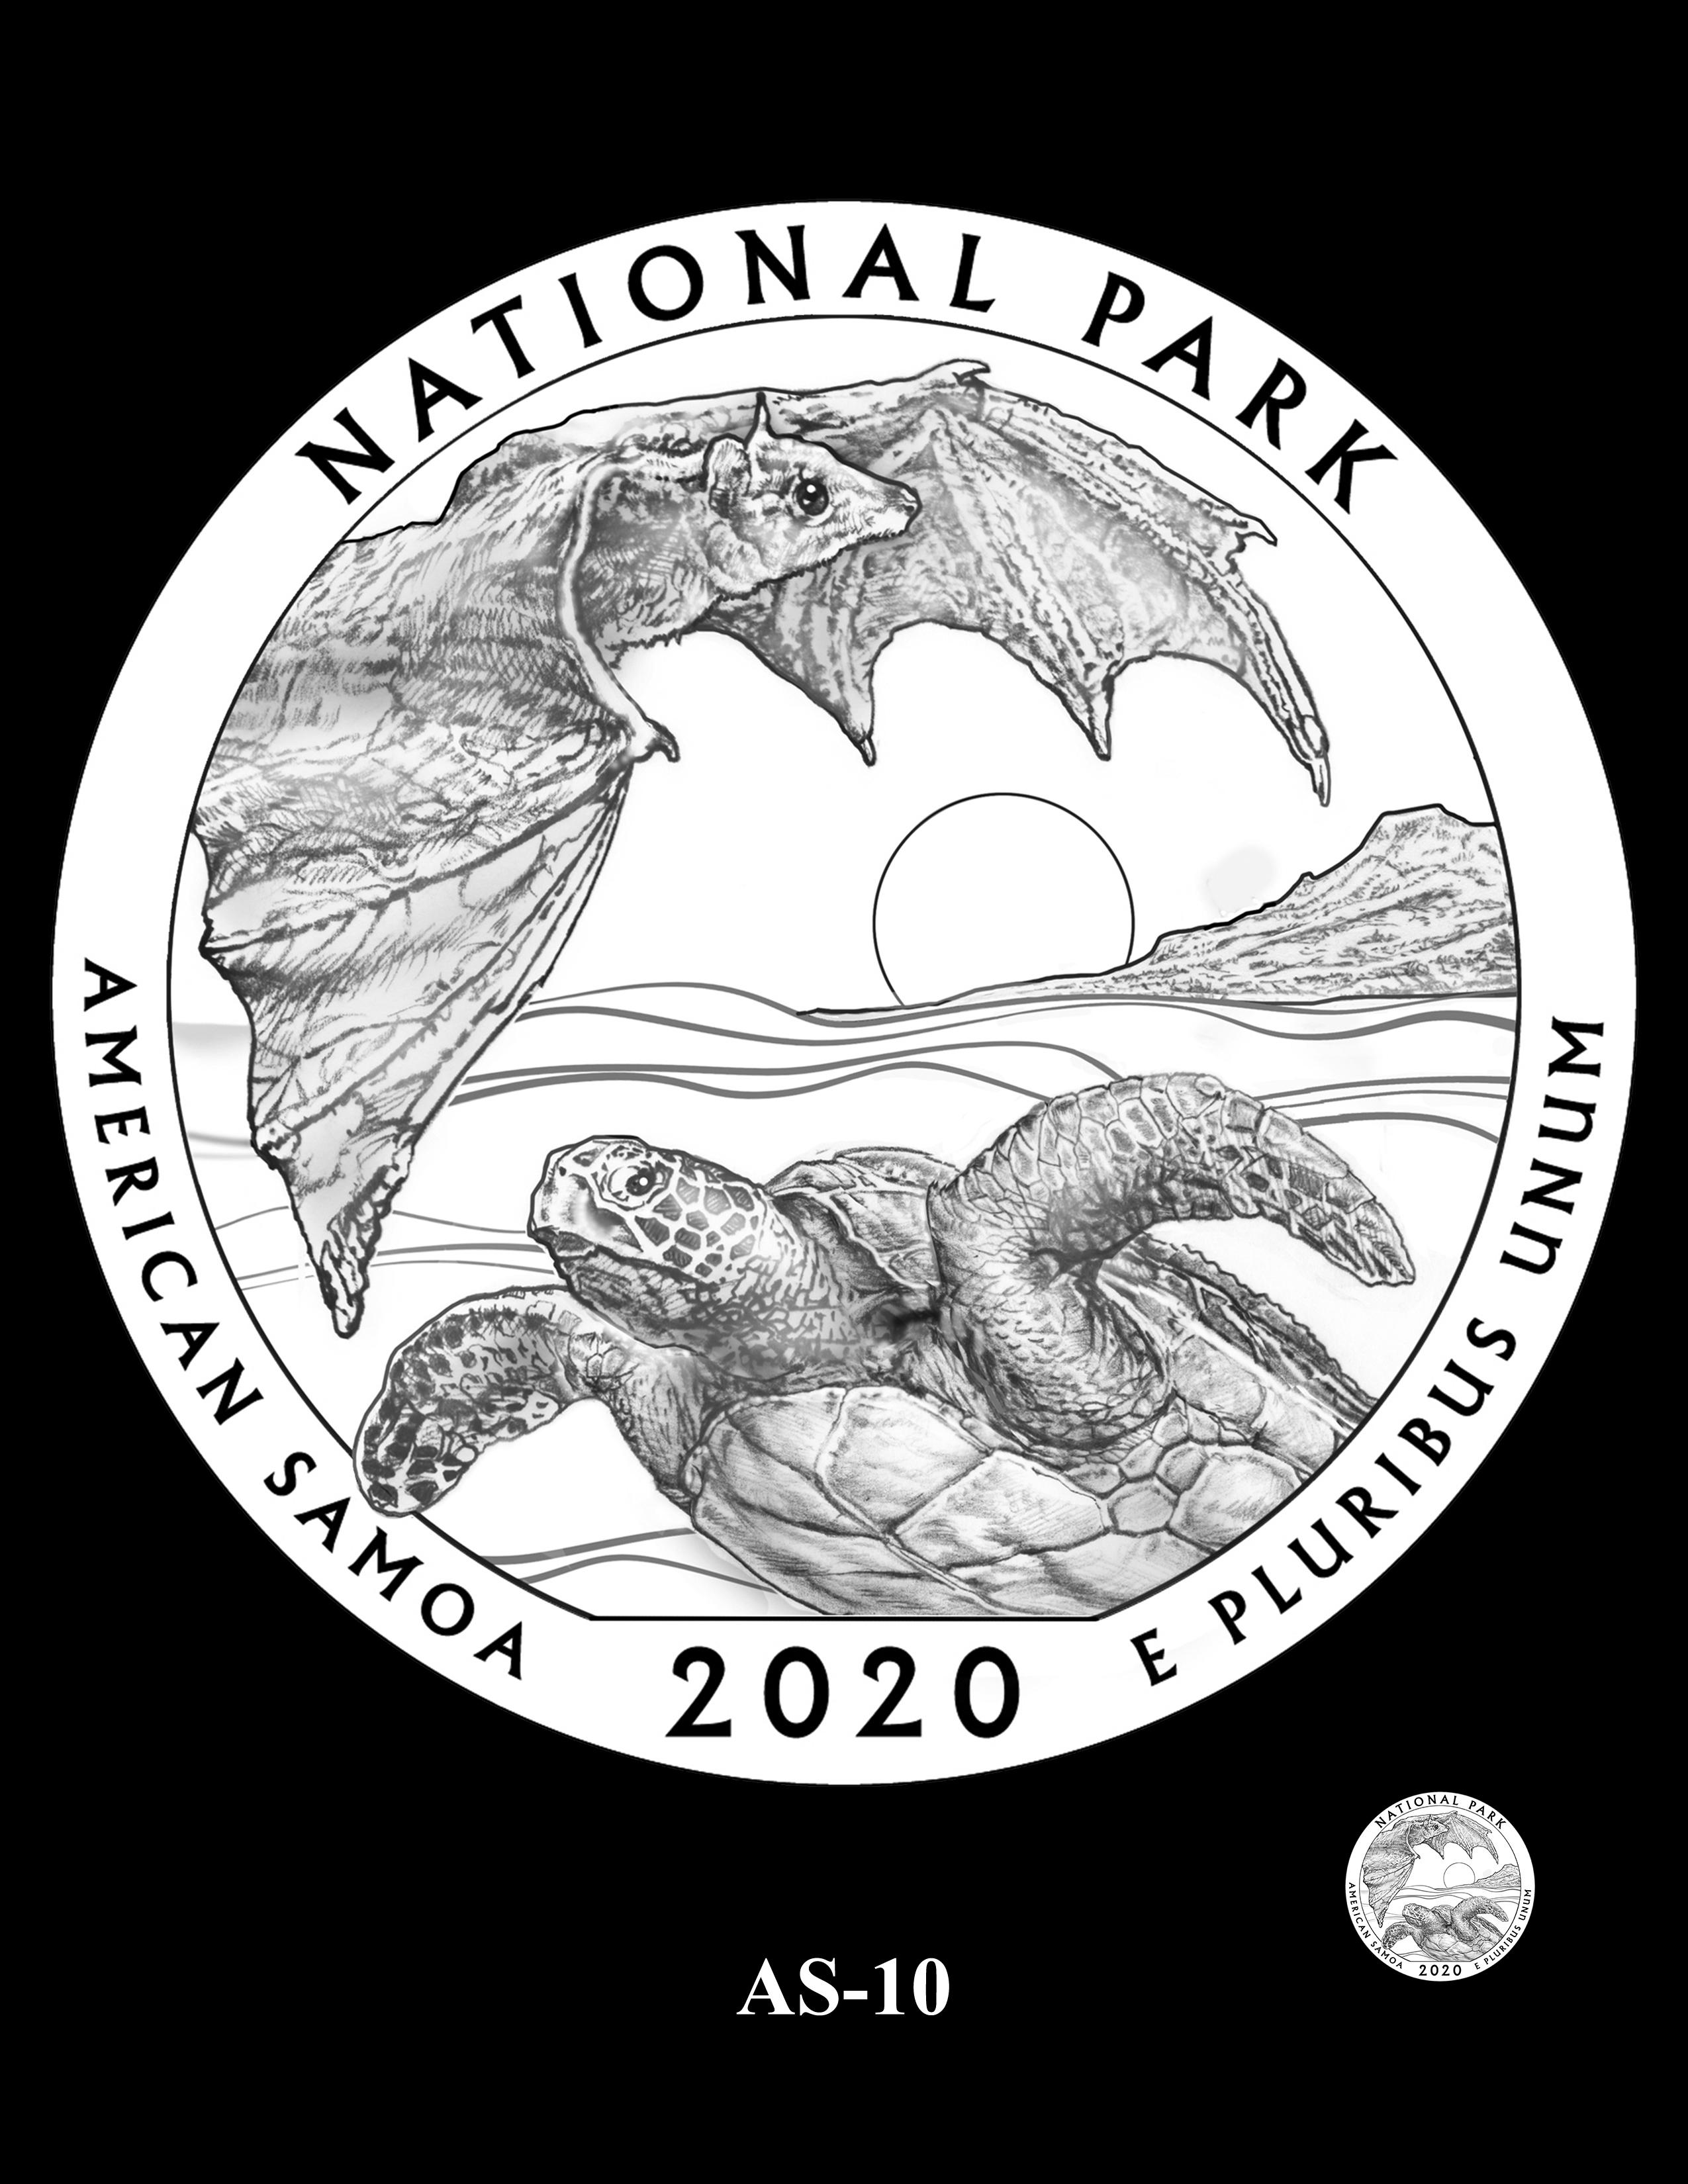 AS-10 -- 2020 America the Beautiful Quarters® Program